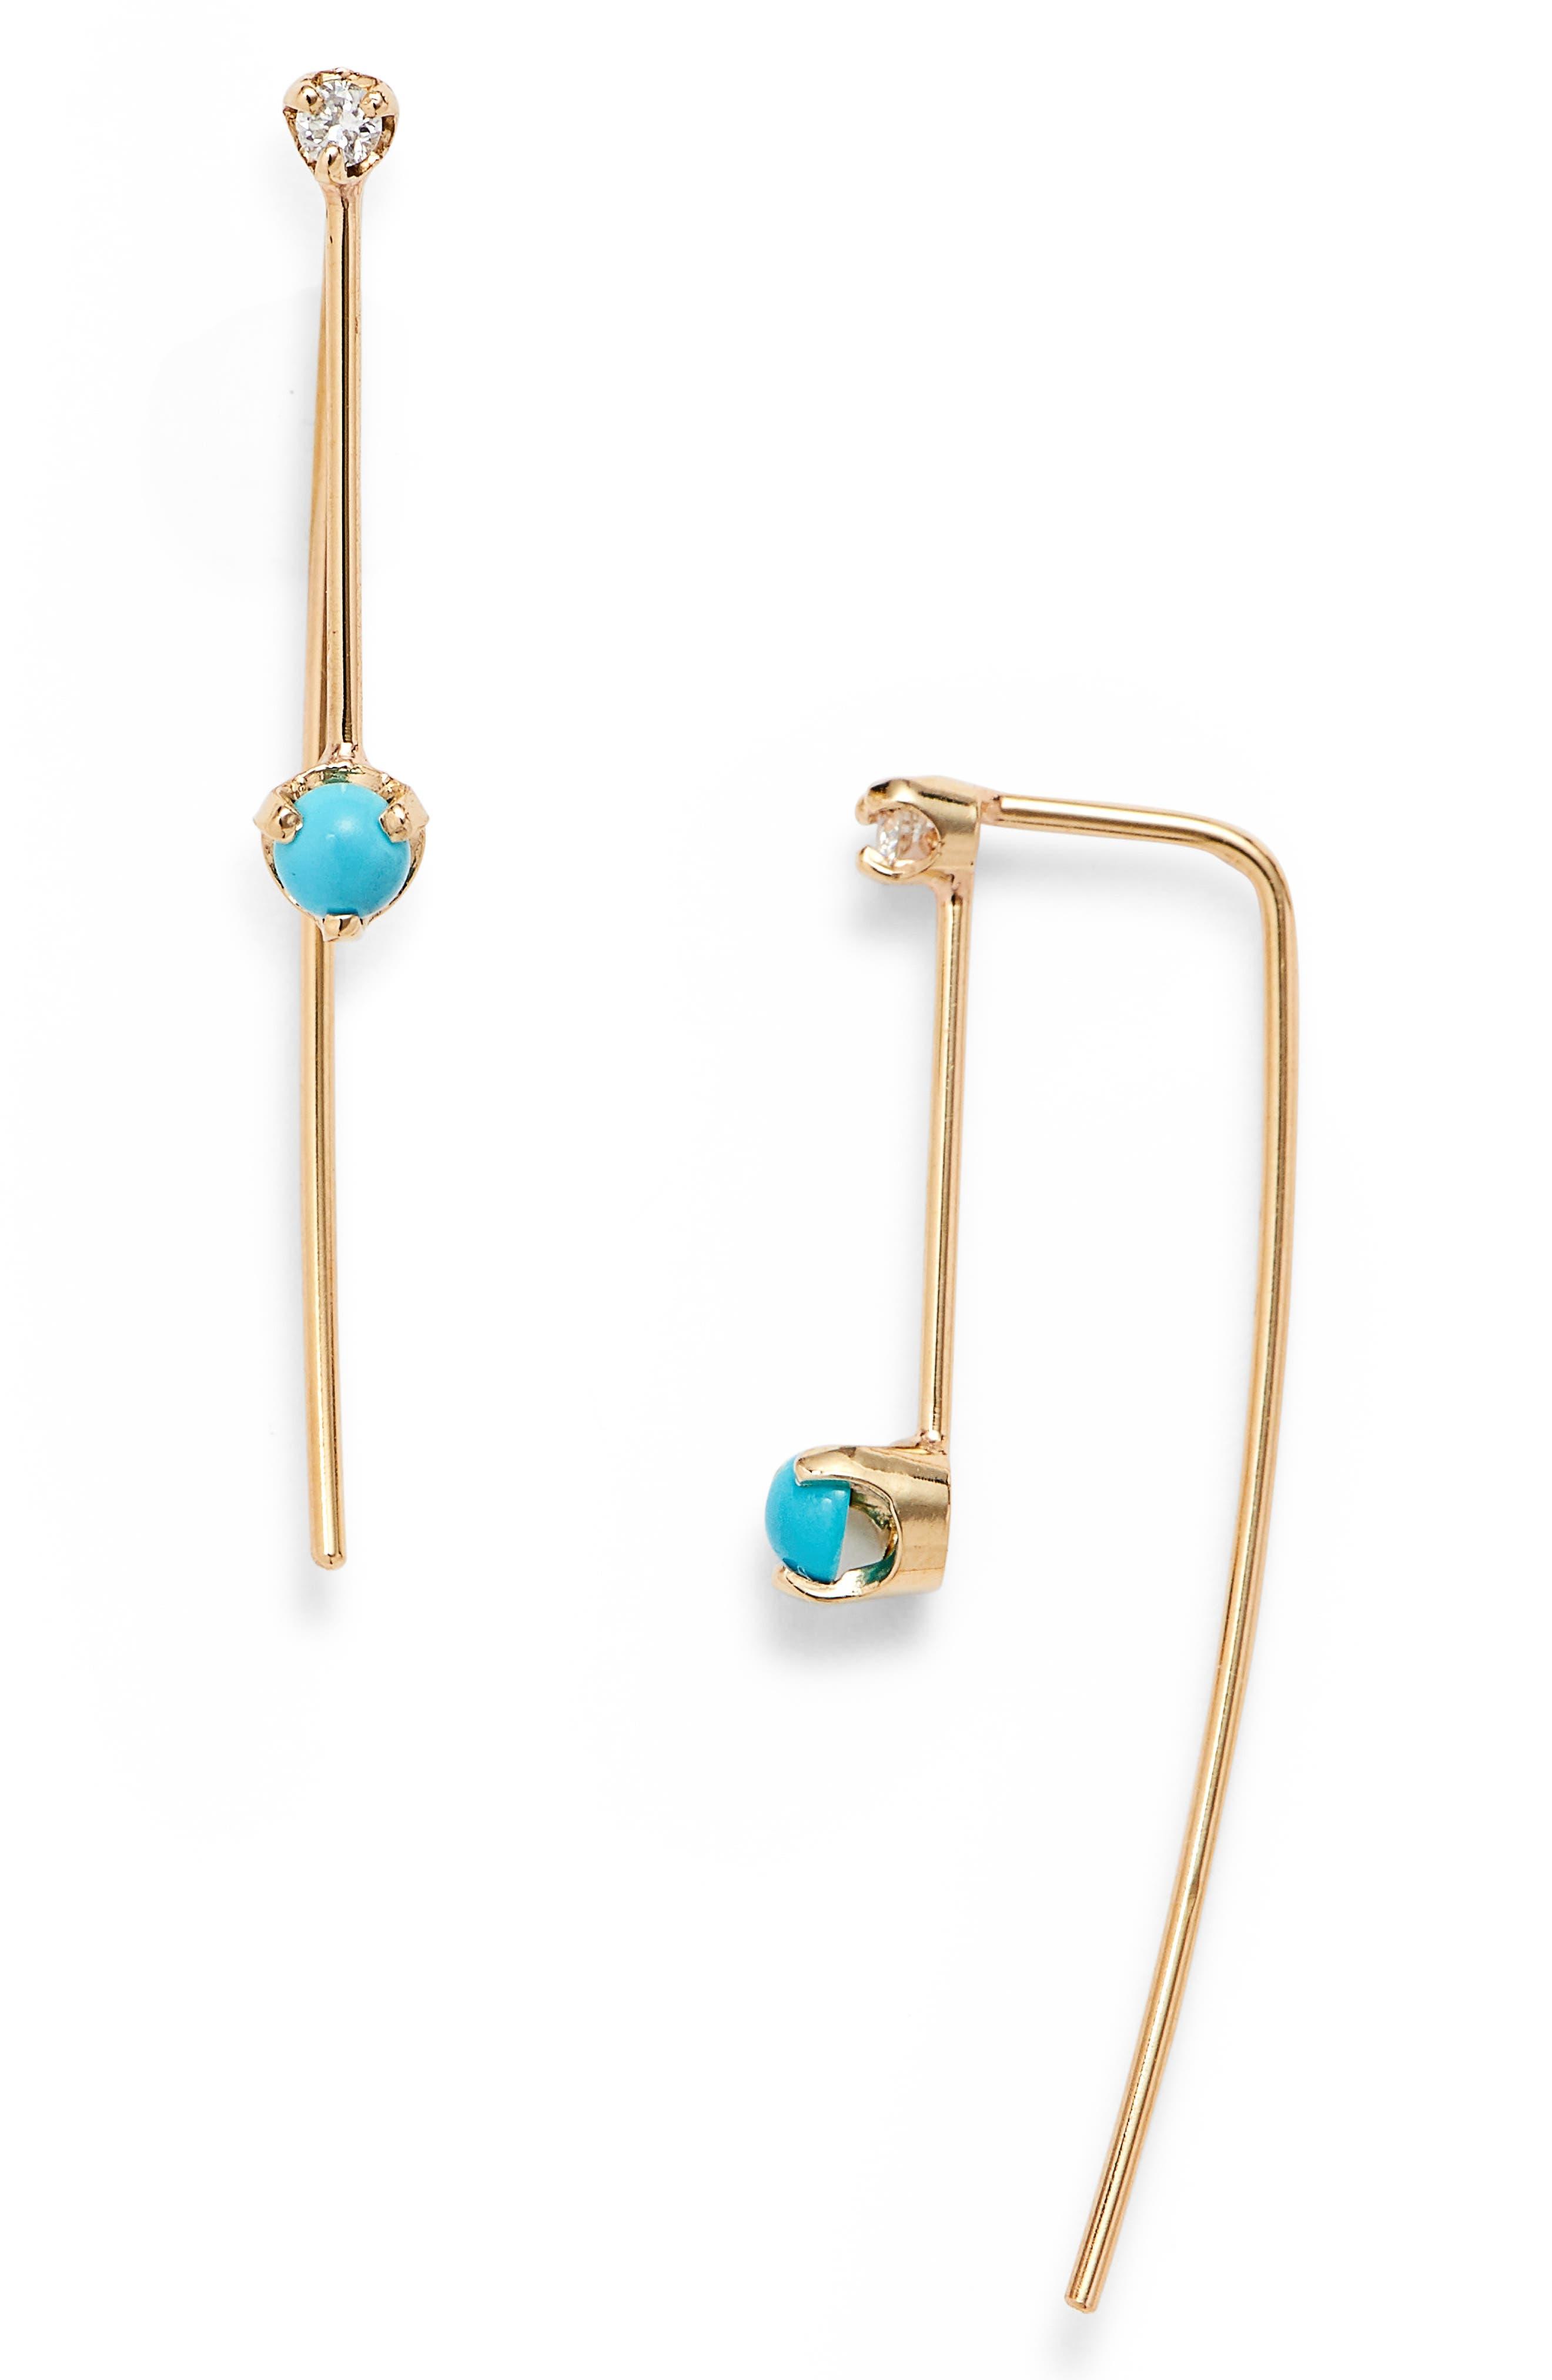 Turquoise & Diamond Threader Earrings,                             Main thumbnail 1, color,                             Yellow Gold